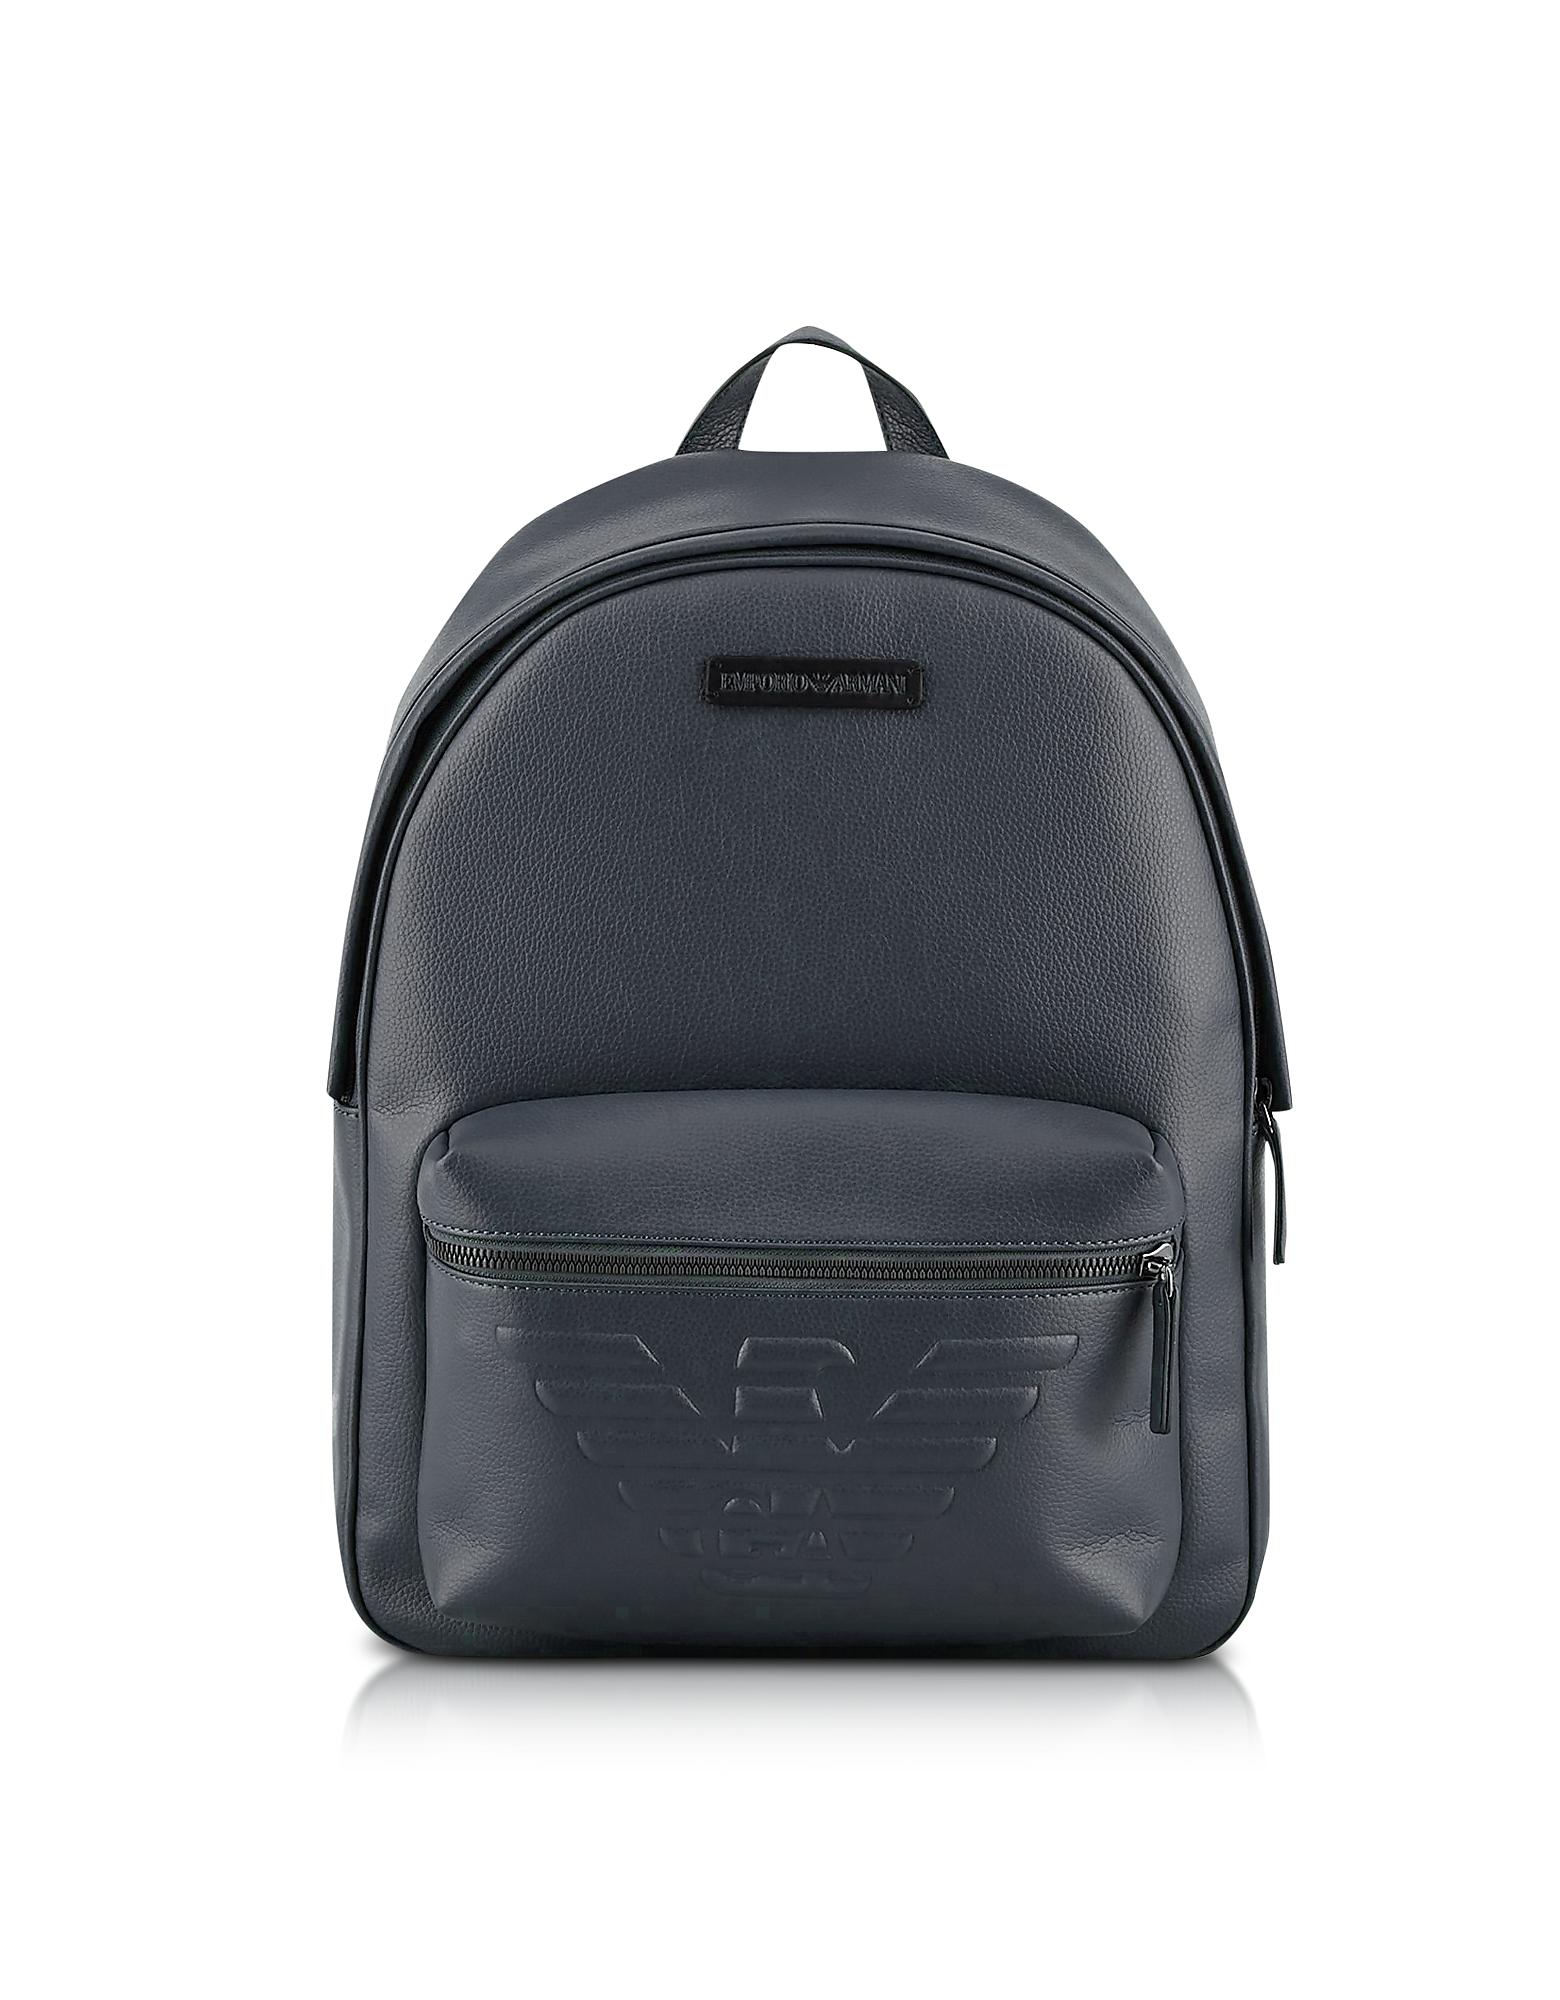 Pebble Leather Eagle Backpack, Navy blue